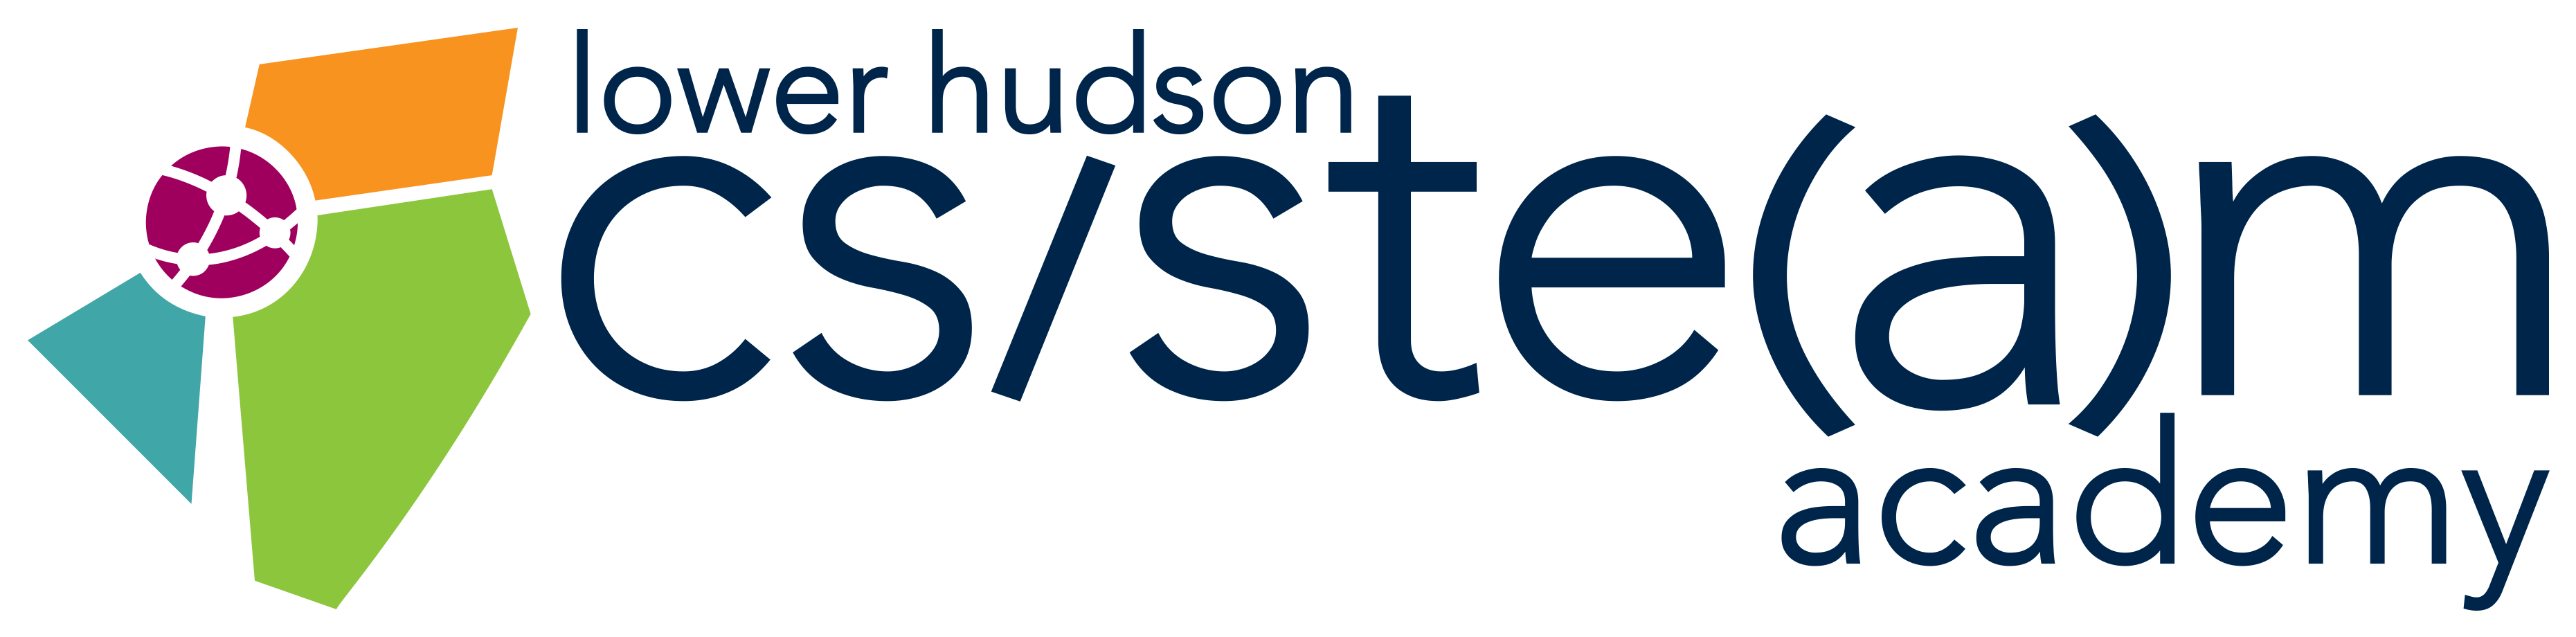 LHCSSA logo image